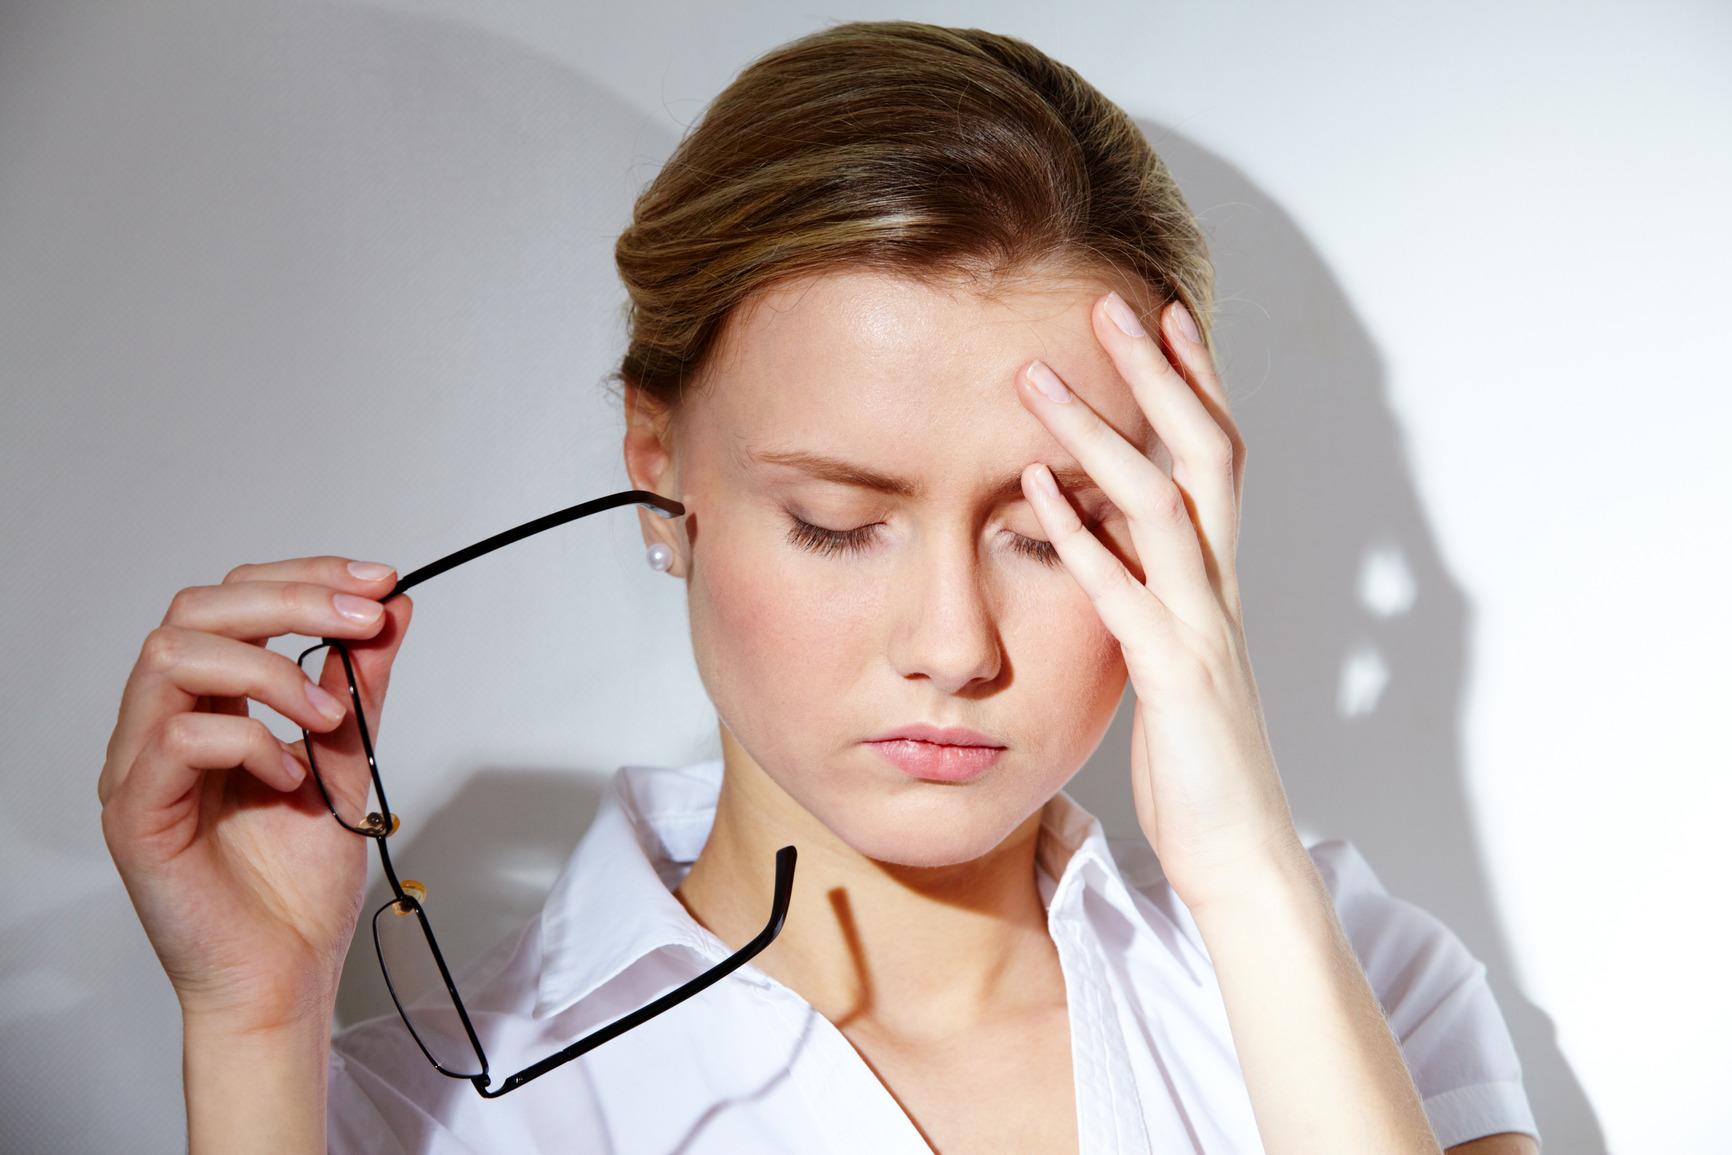 Portrait of young businesswoman having headache pains